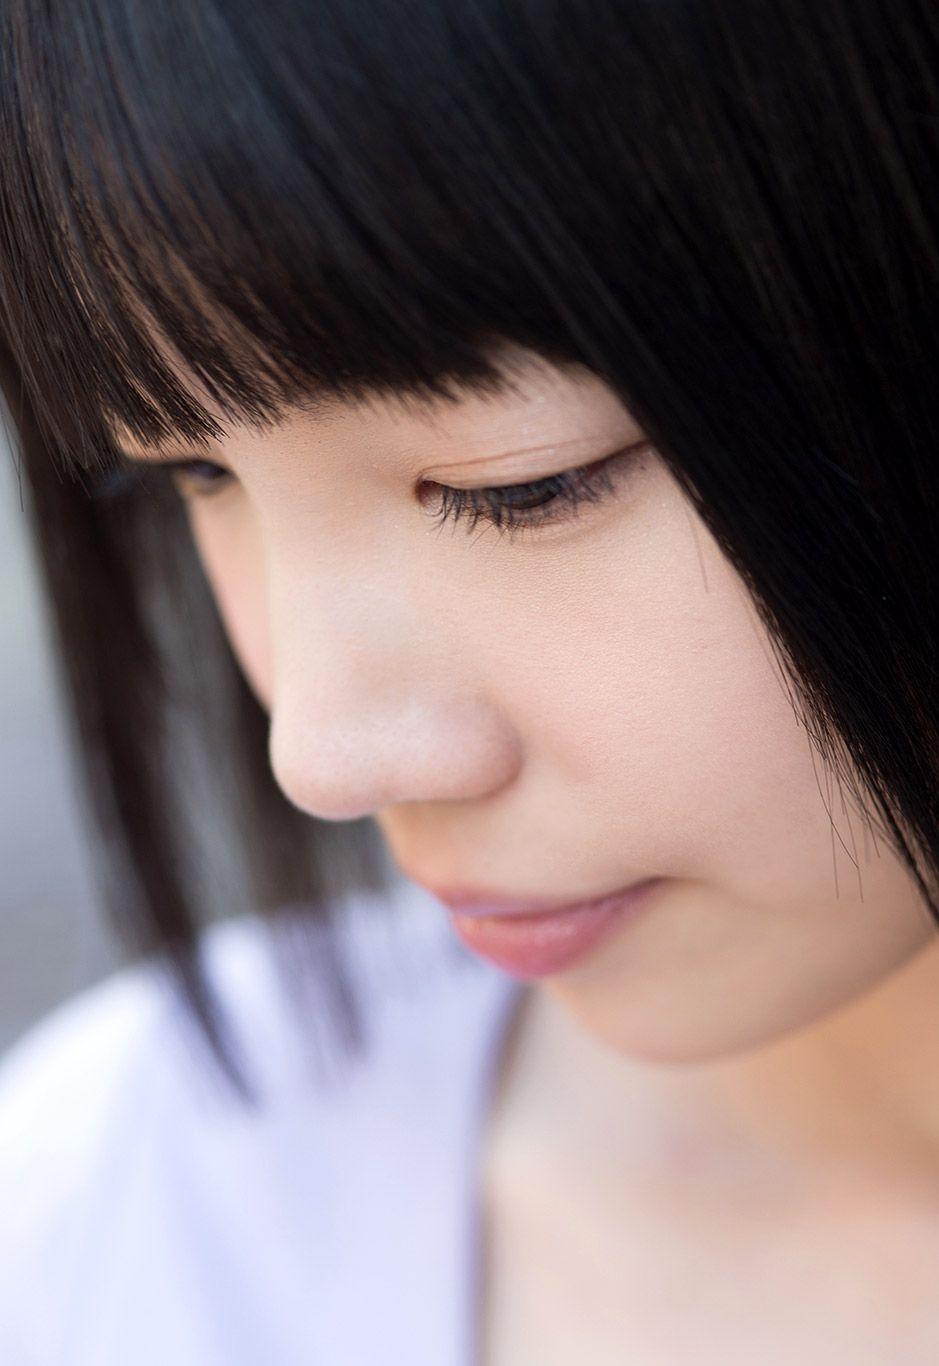 Koharu Suzuki 鈴木心春 Photo AV Idol Gallery No.18 | Photos